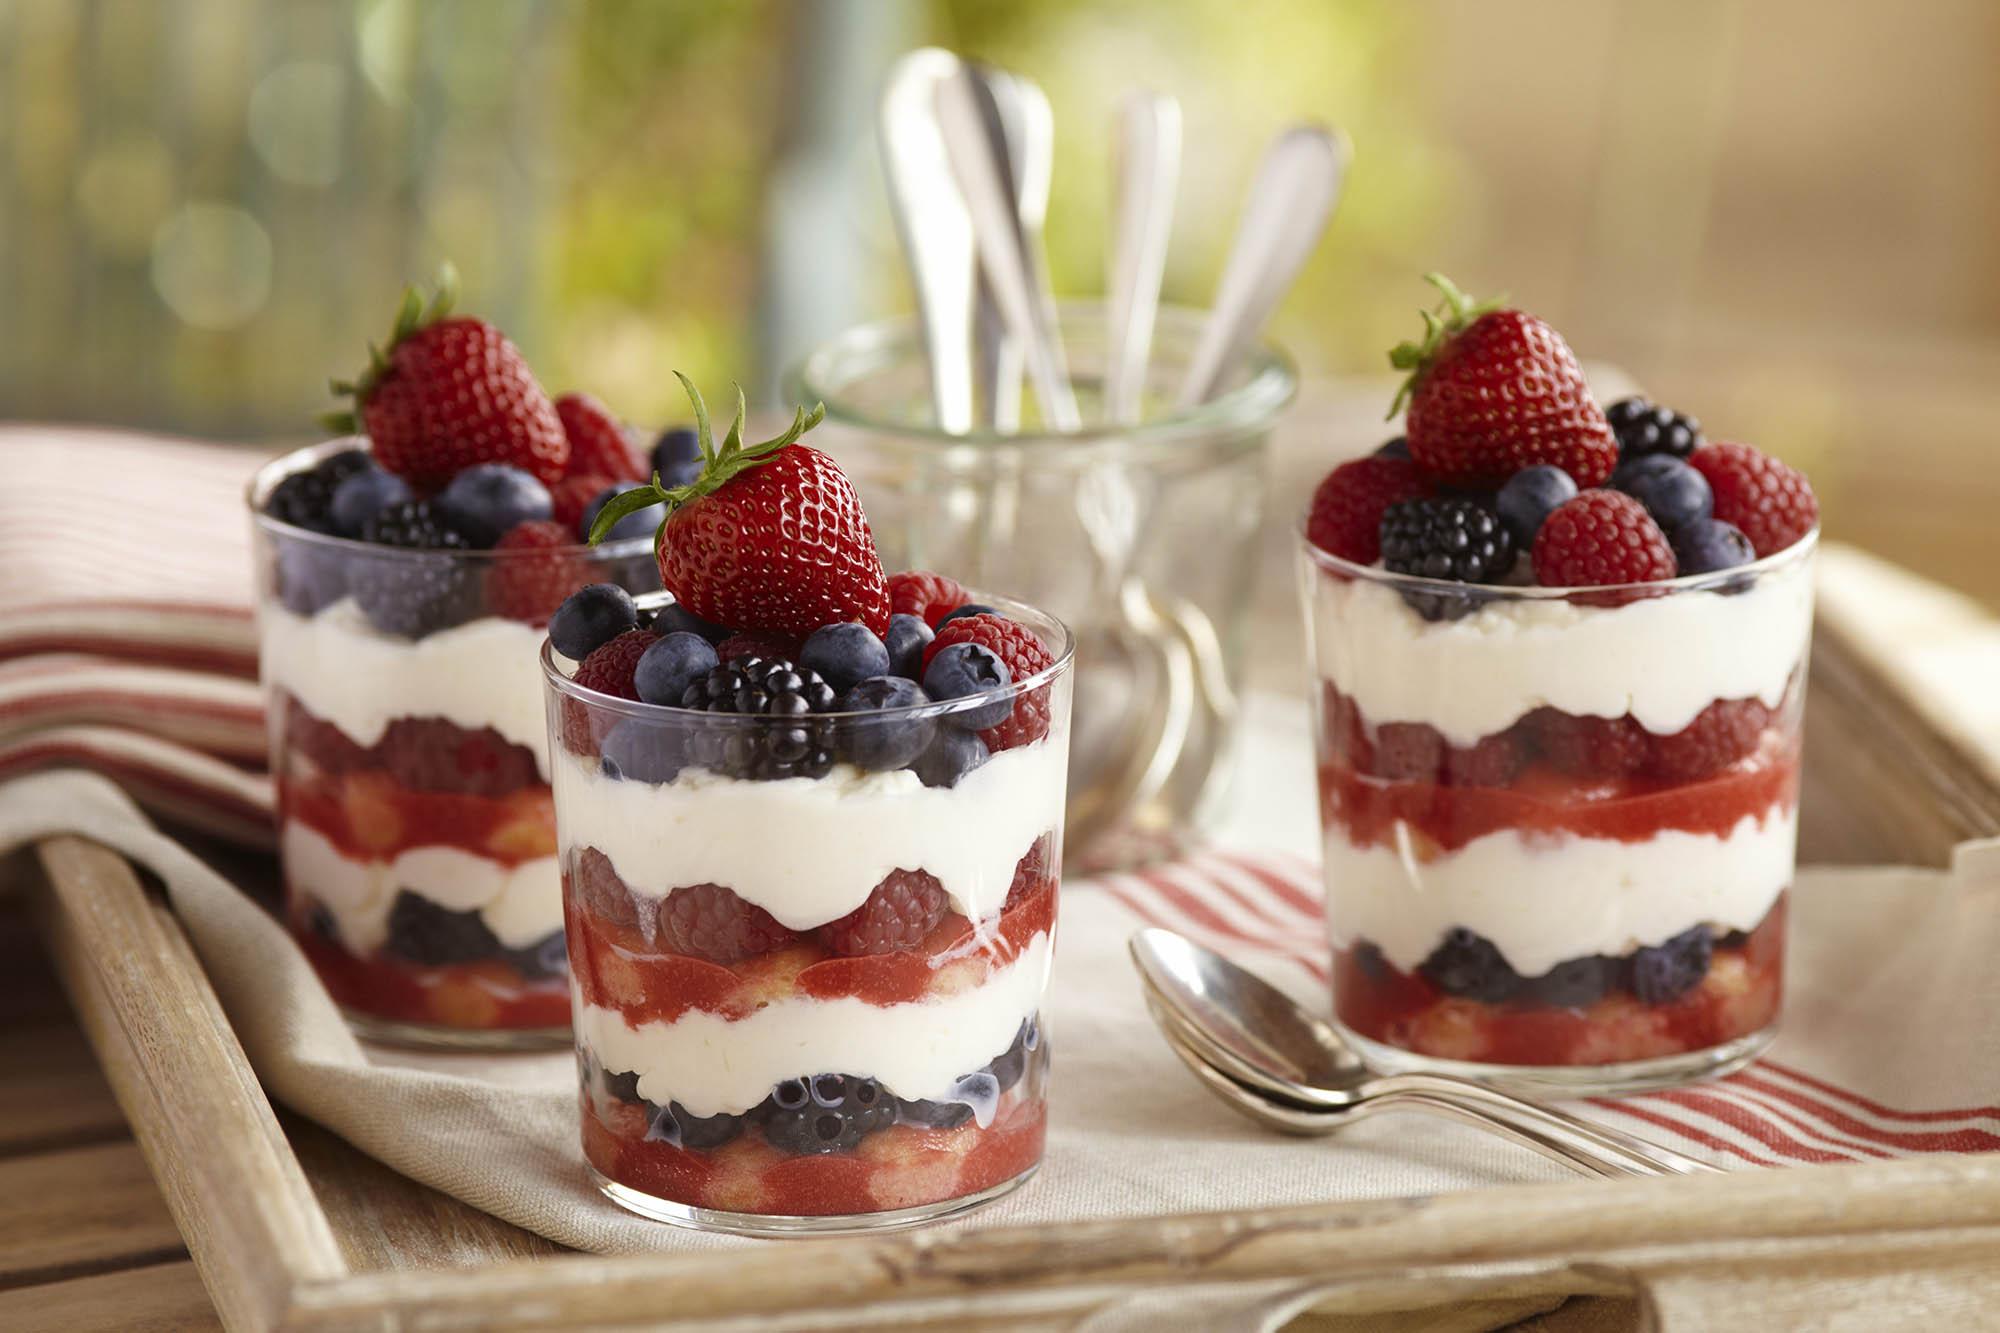 Tiramisu Mixed Berry Trifle